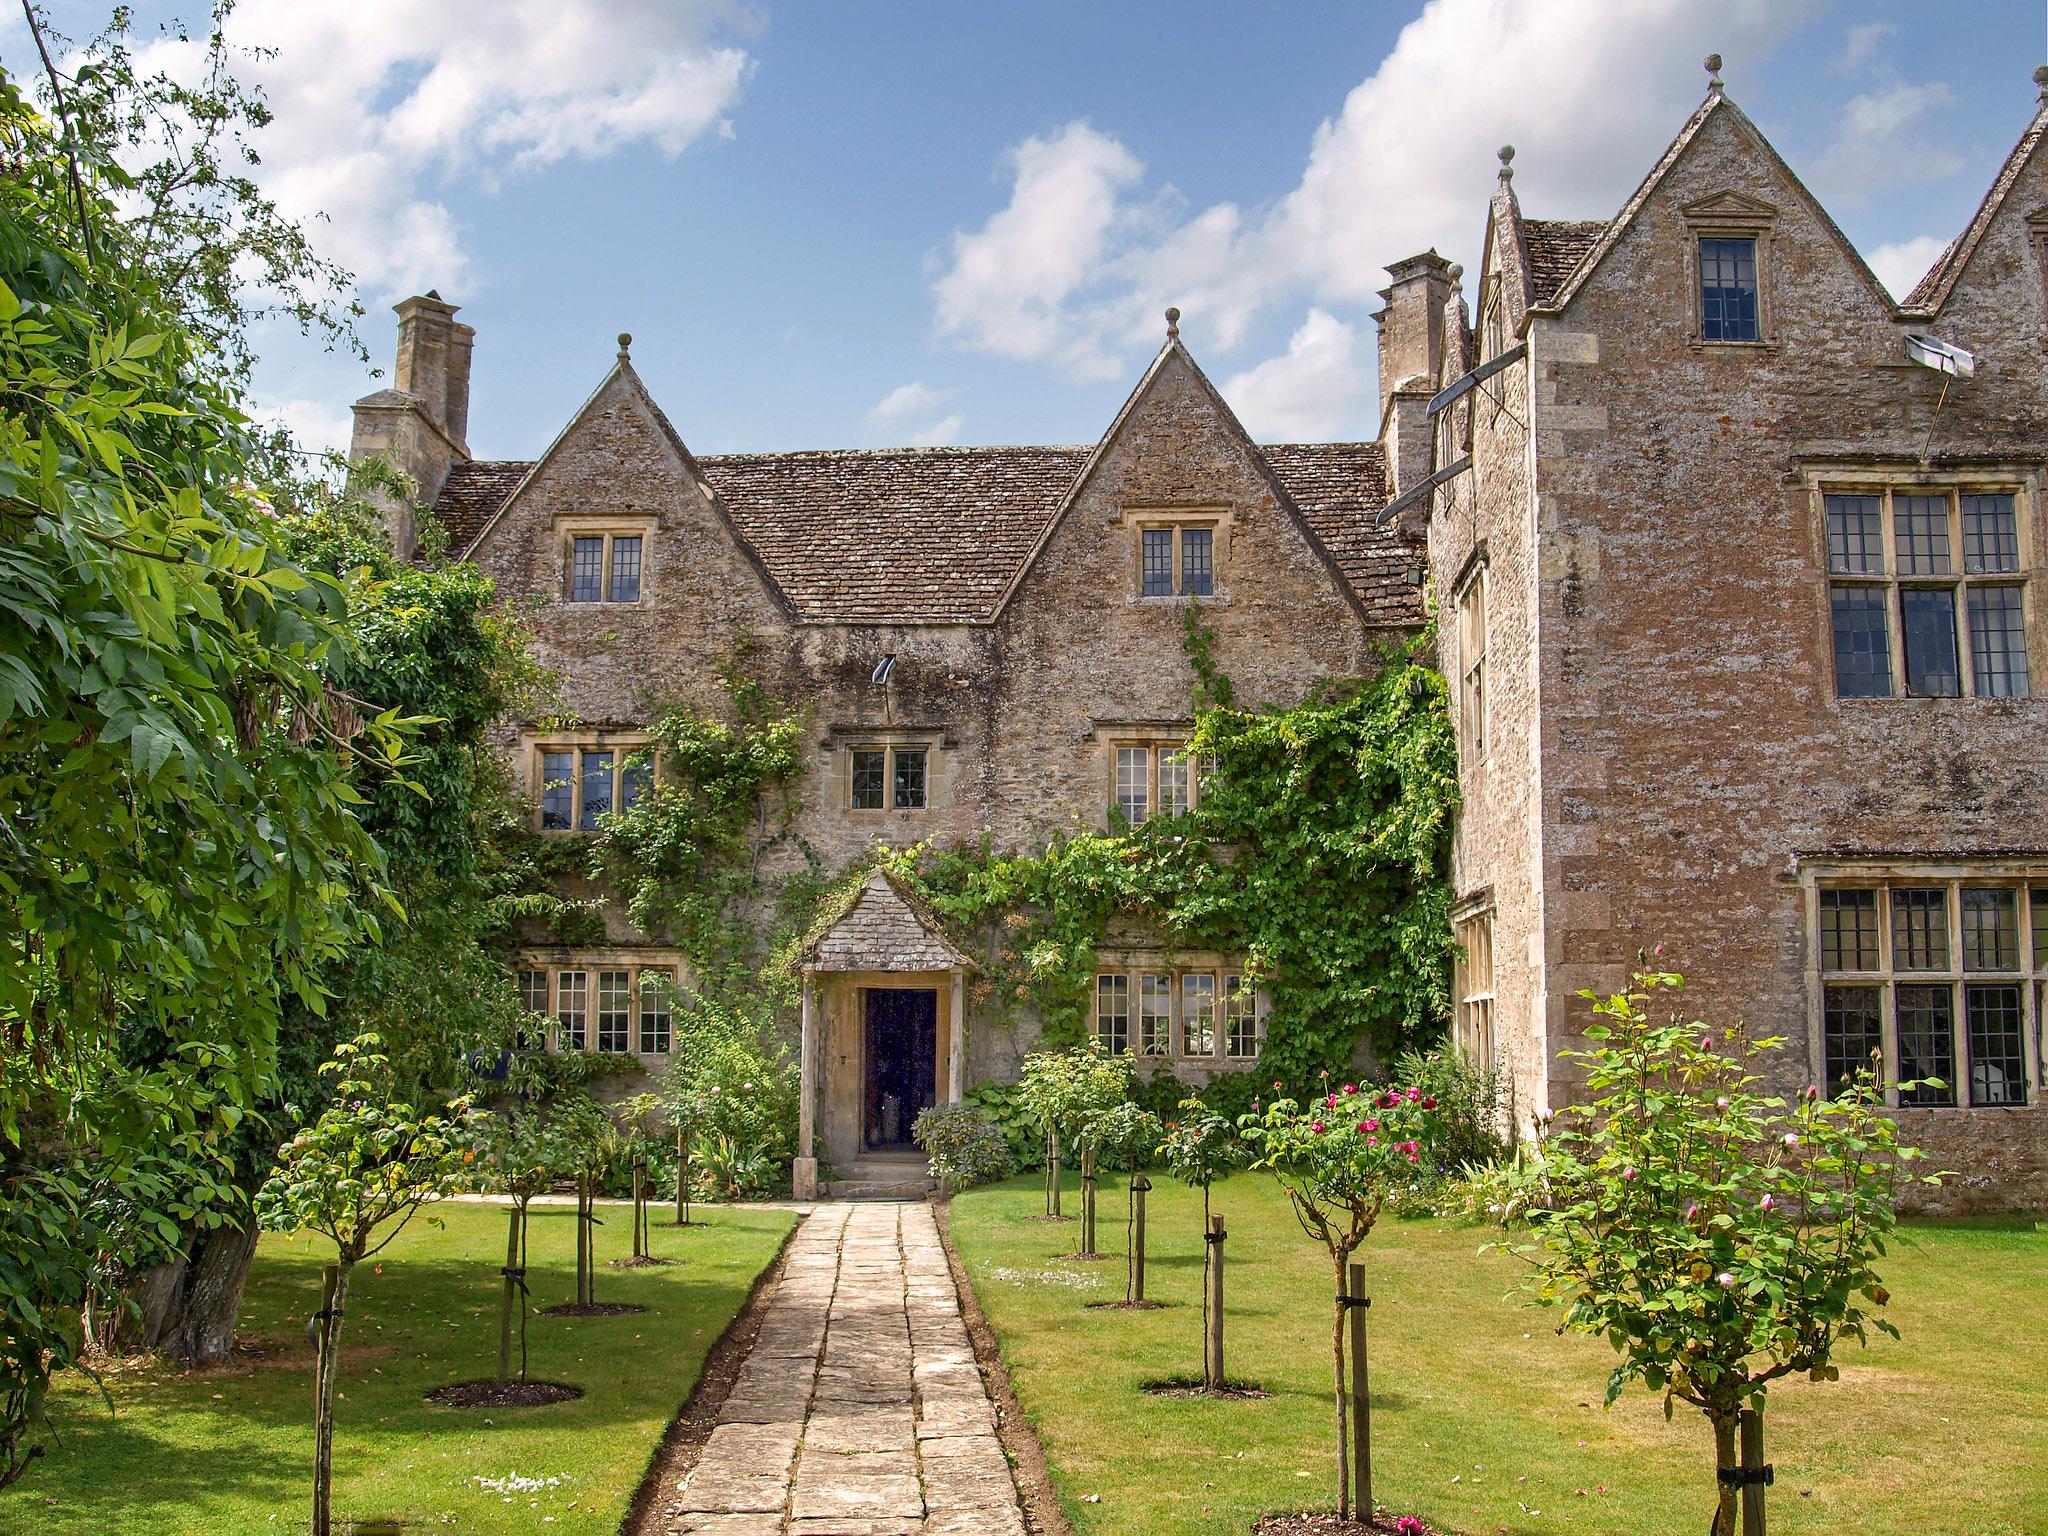 Idyllic Kelmscott Manor, Oxfordshire by Andrew S Brown.jpg